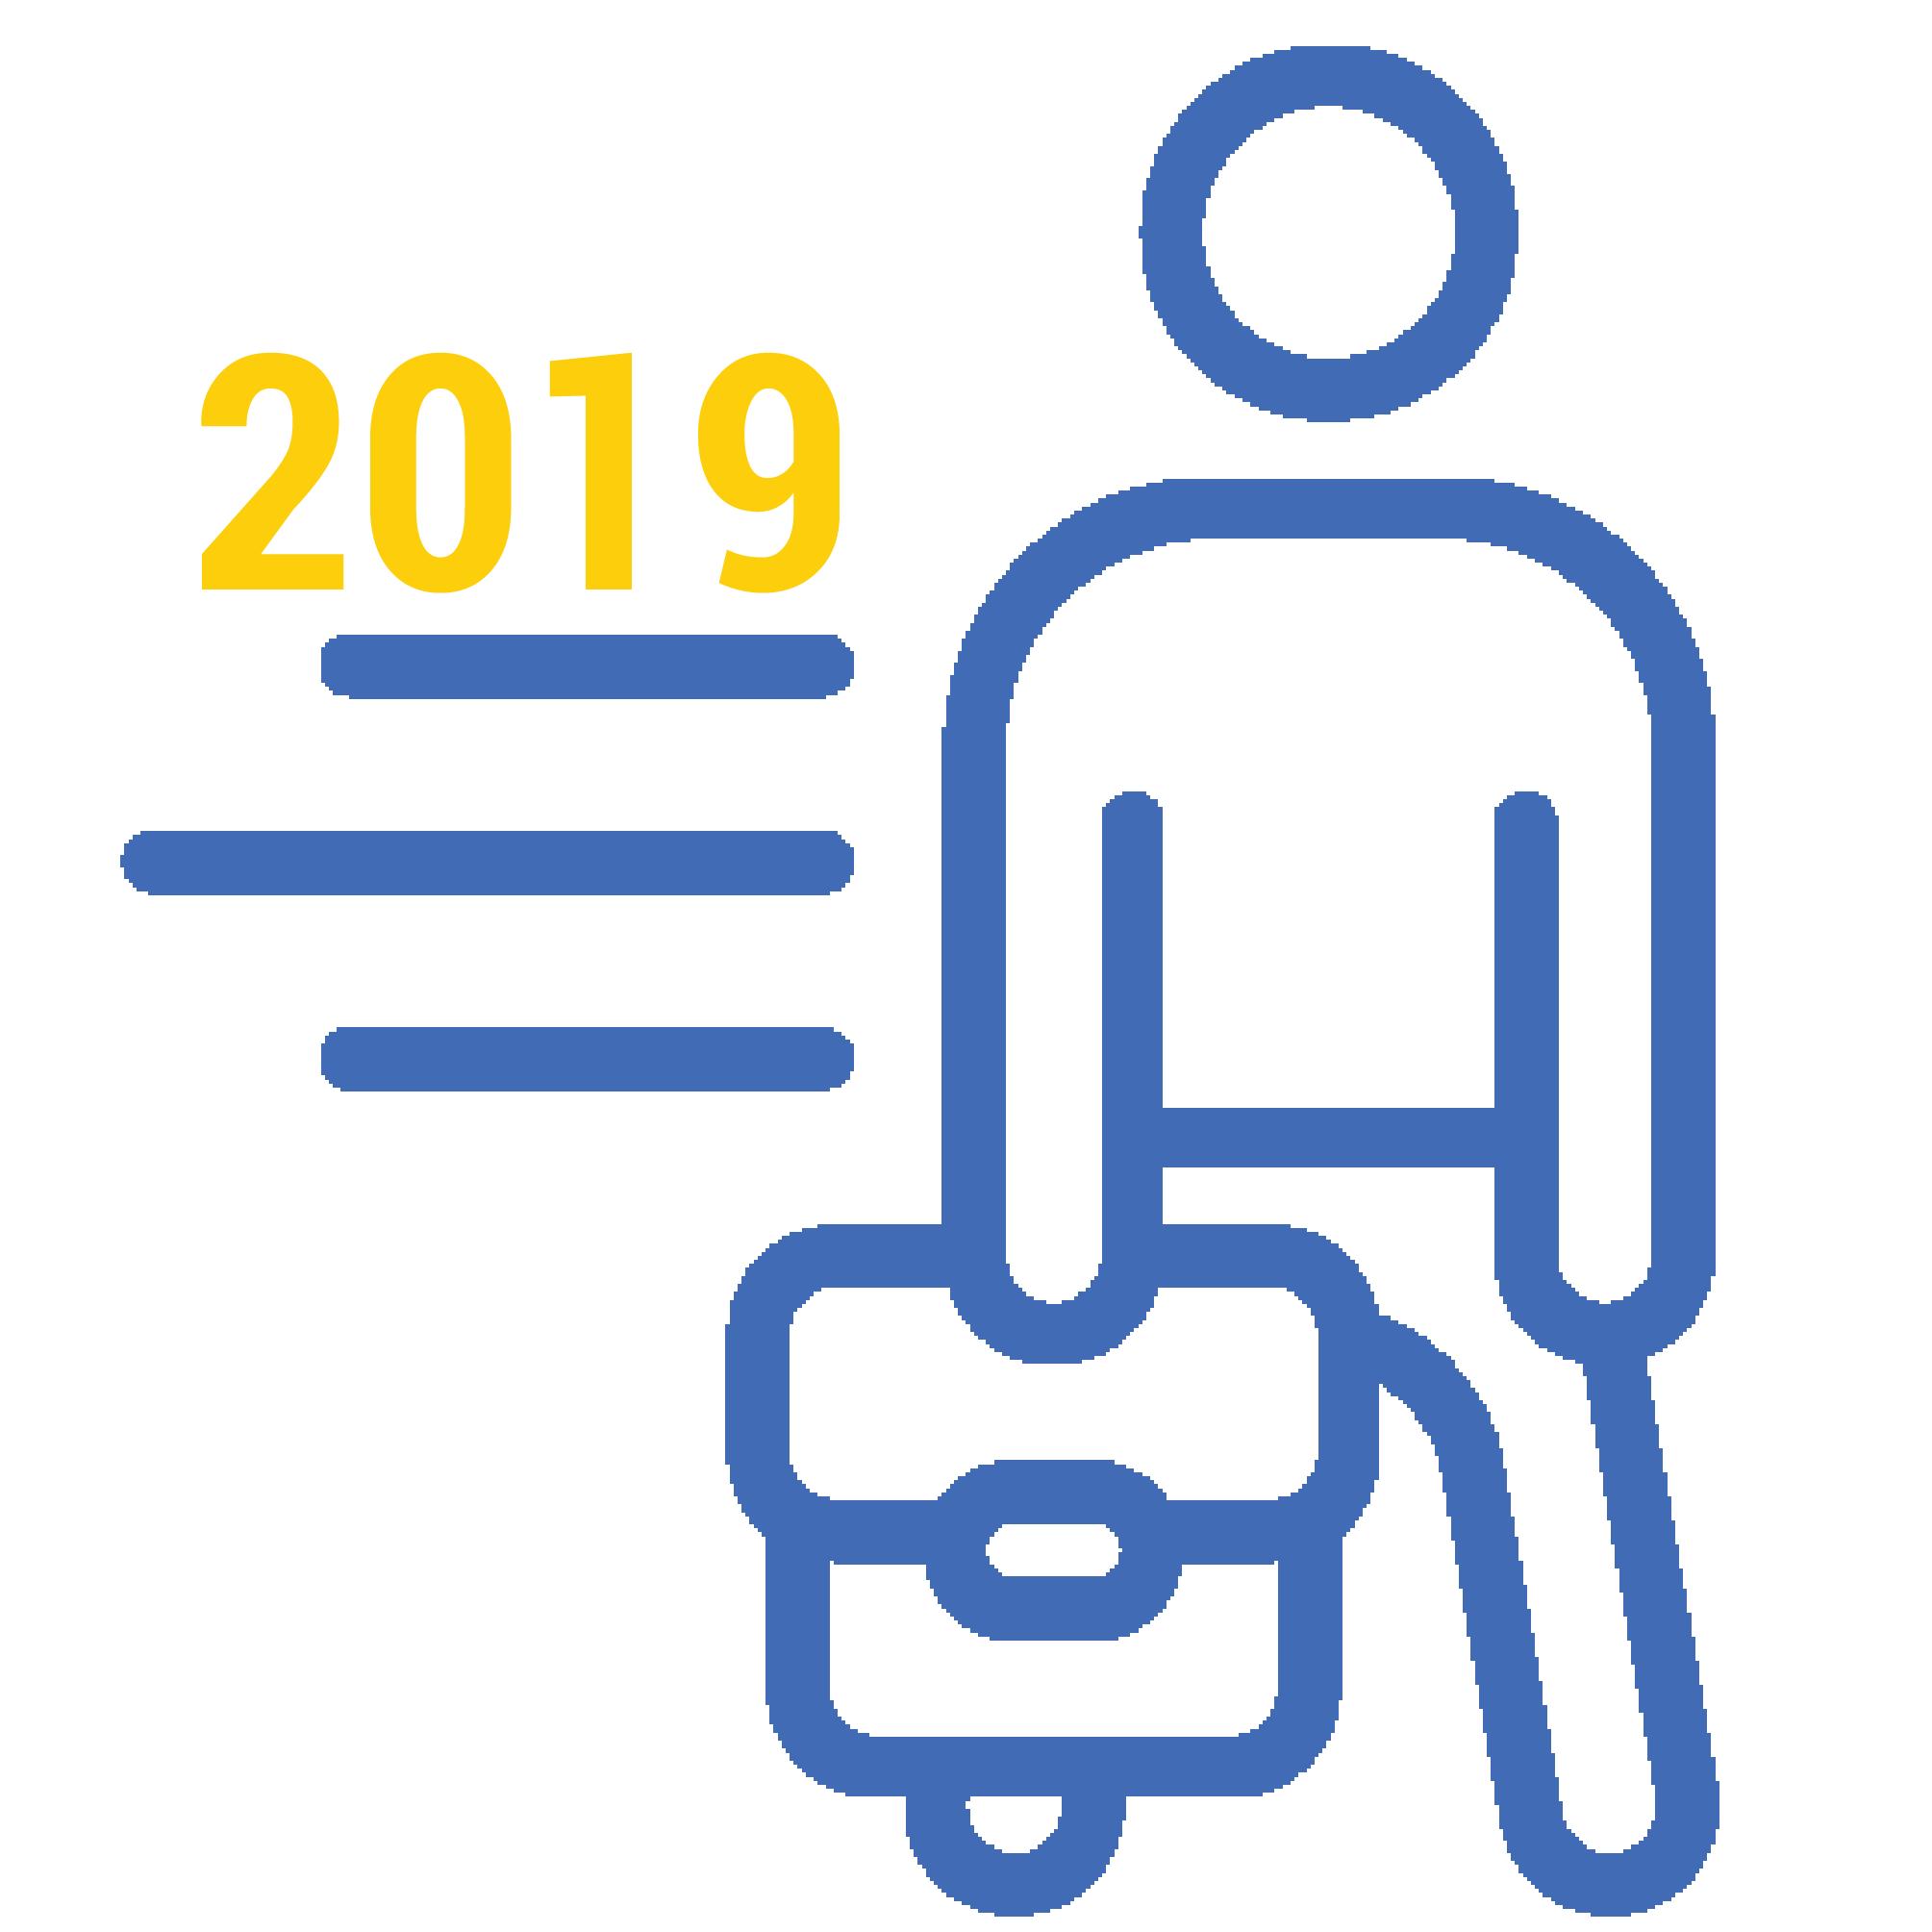 Plano Anual de Atividades 2019